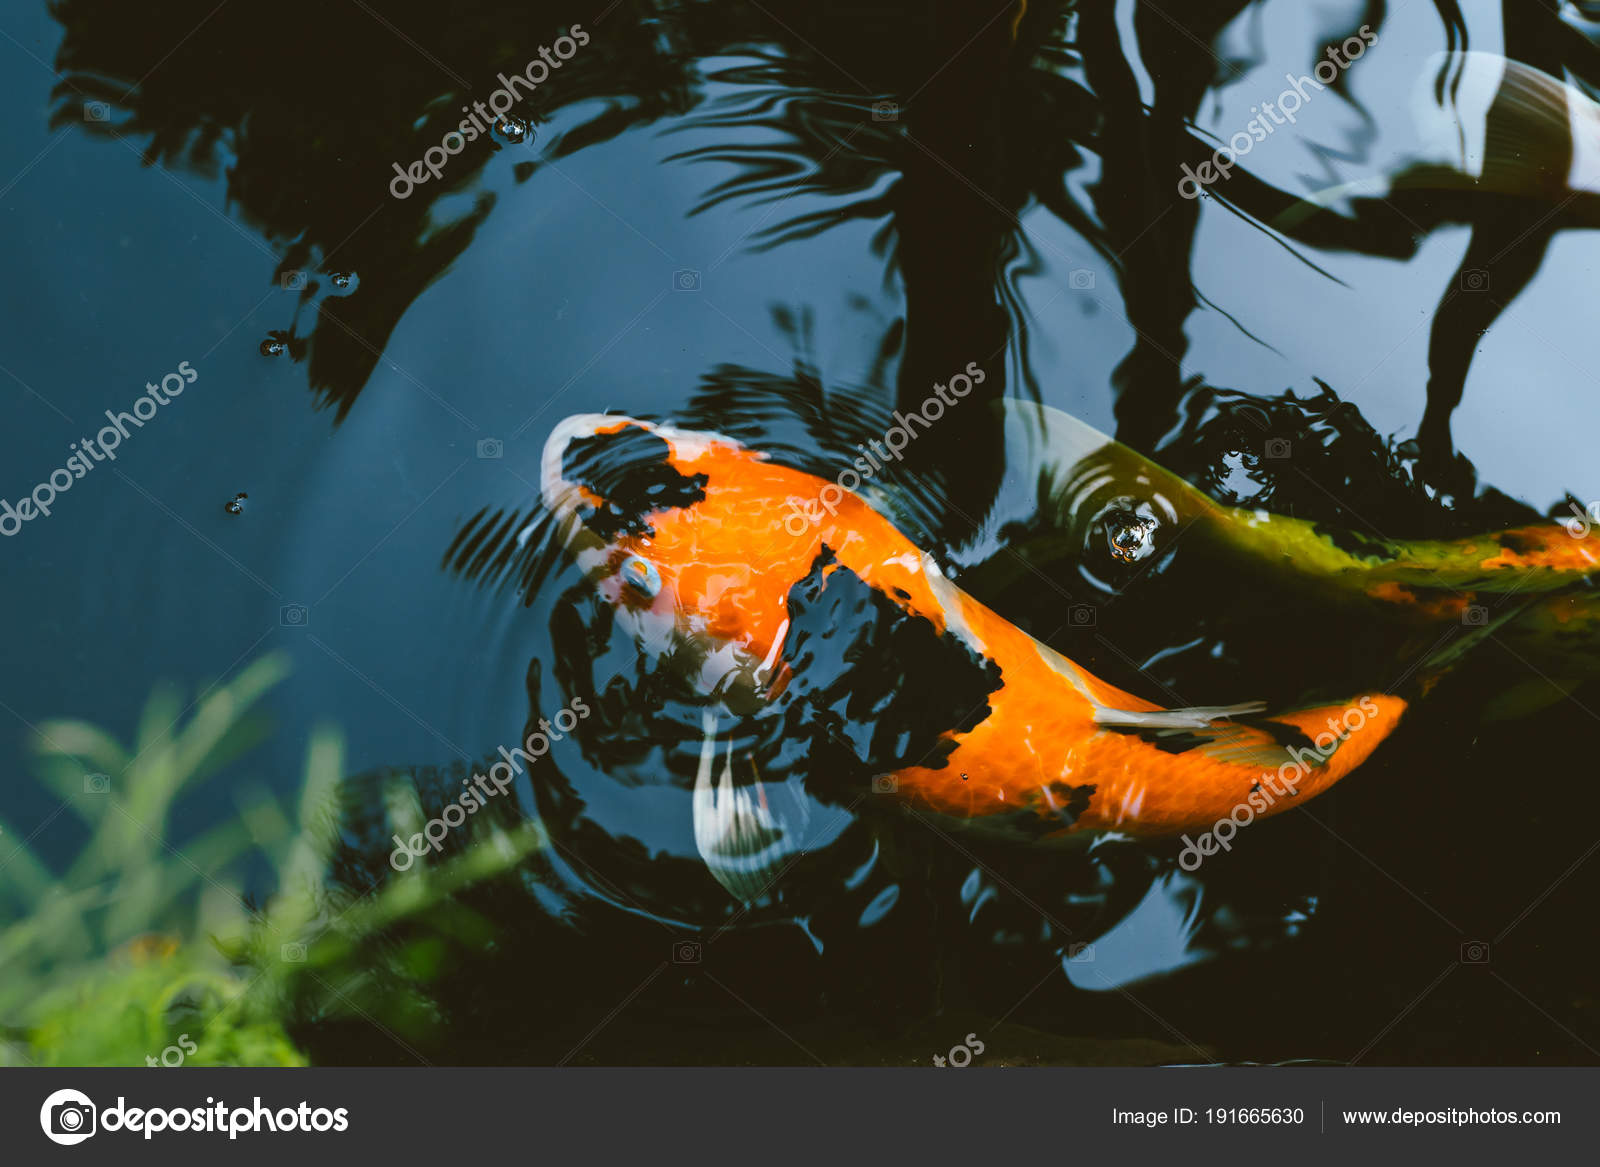 Japan Koi Carp Fish Pond Vintage Colortone Stock Photo C Coffeekai 191665630